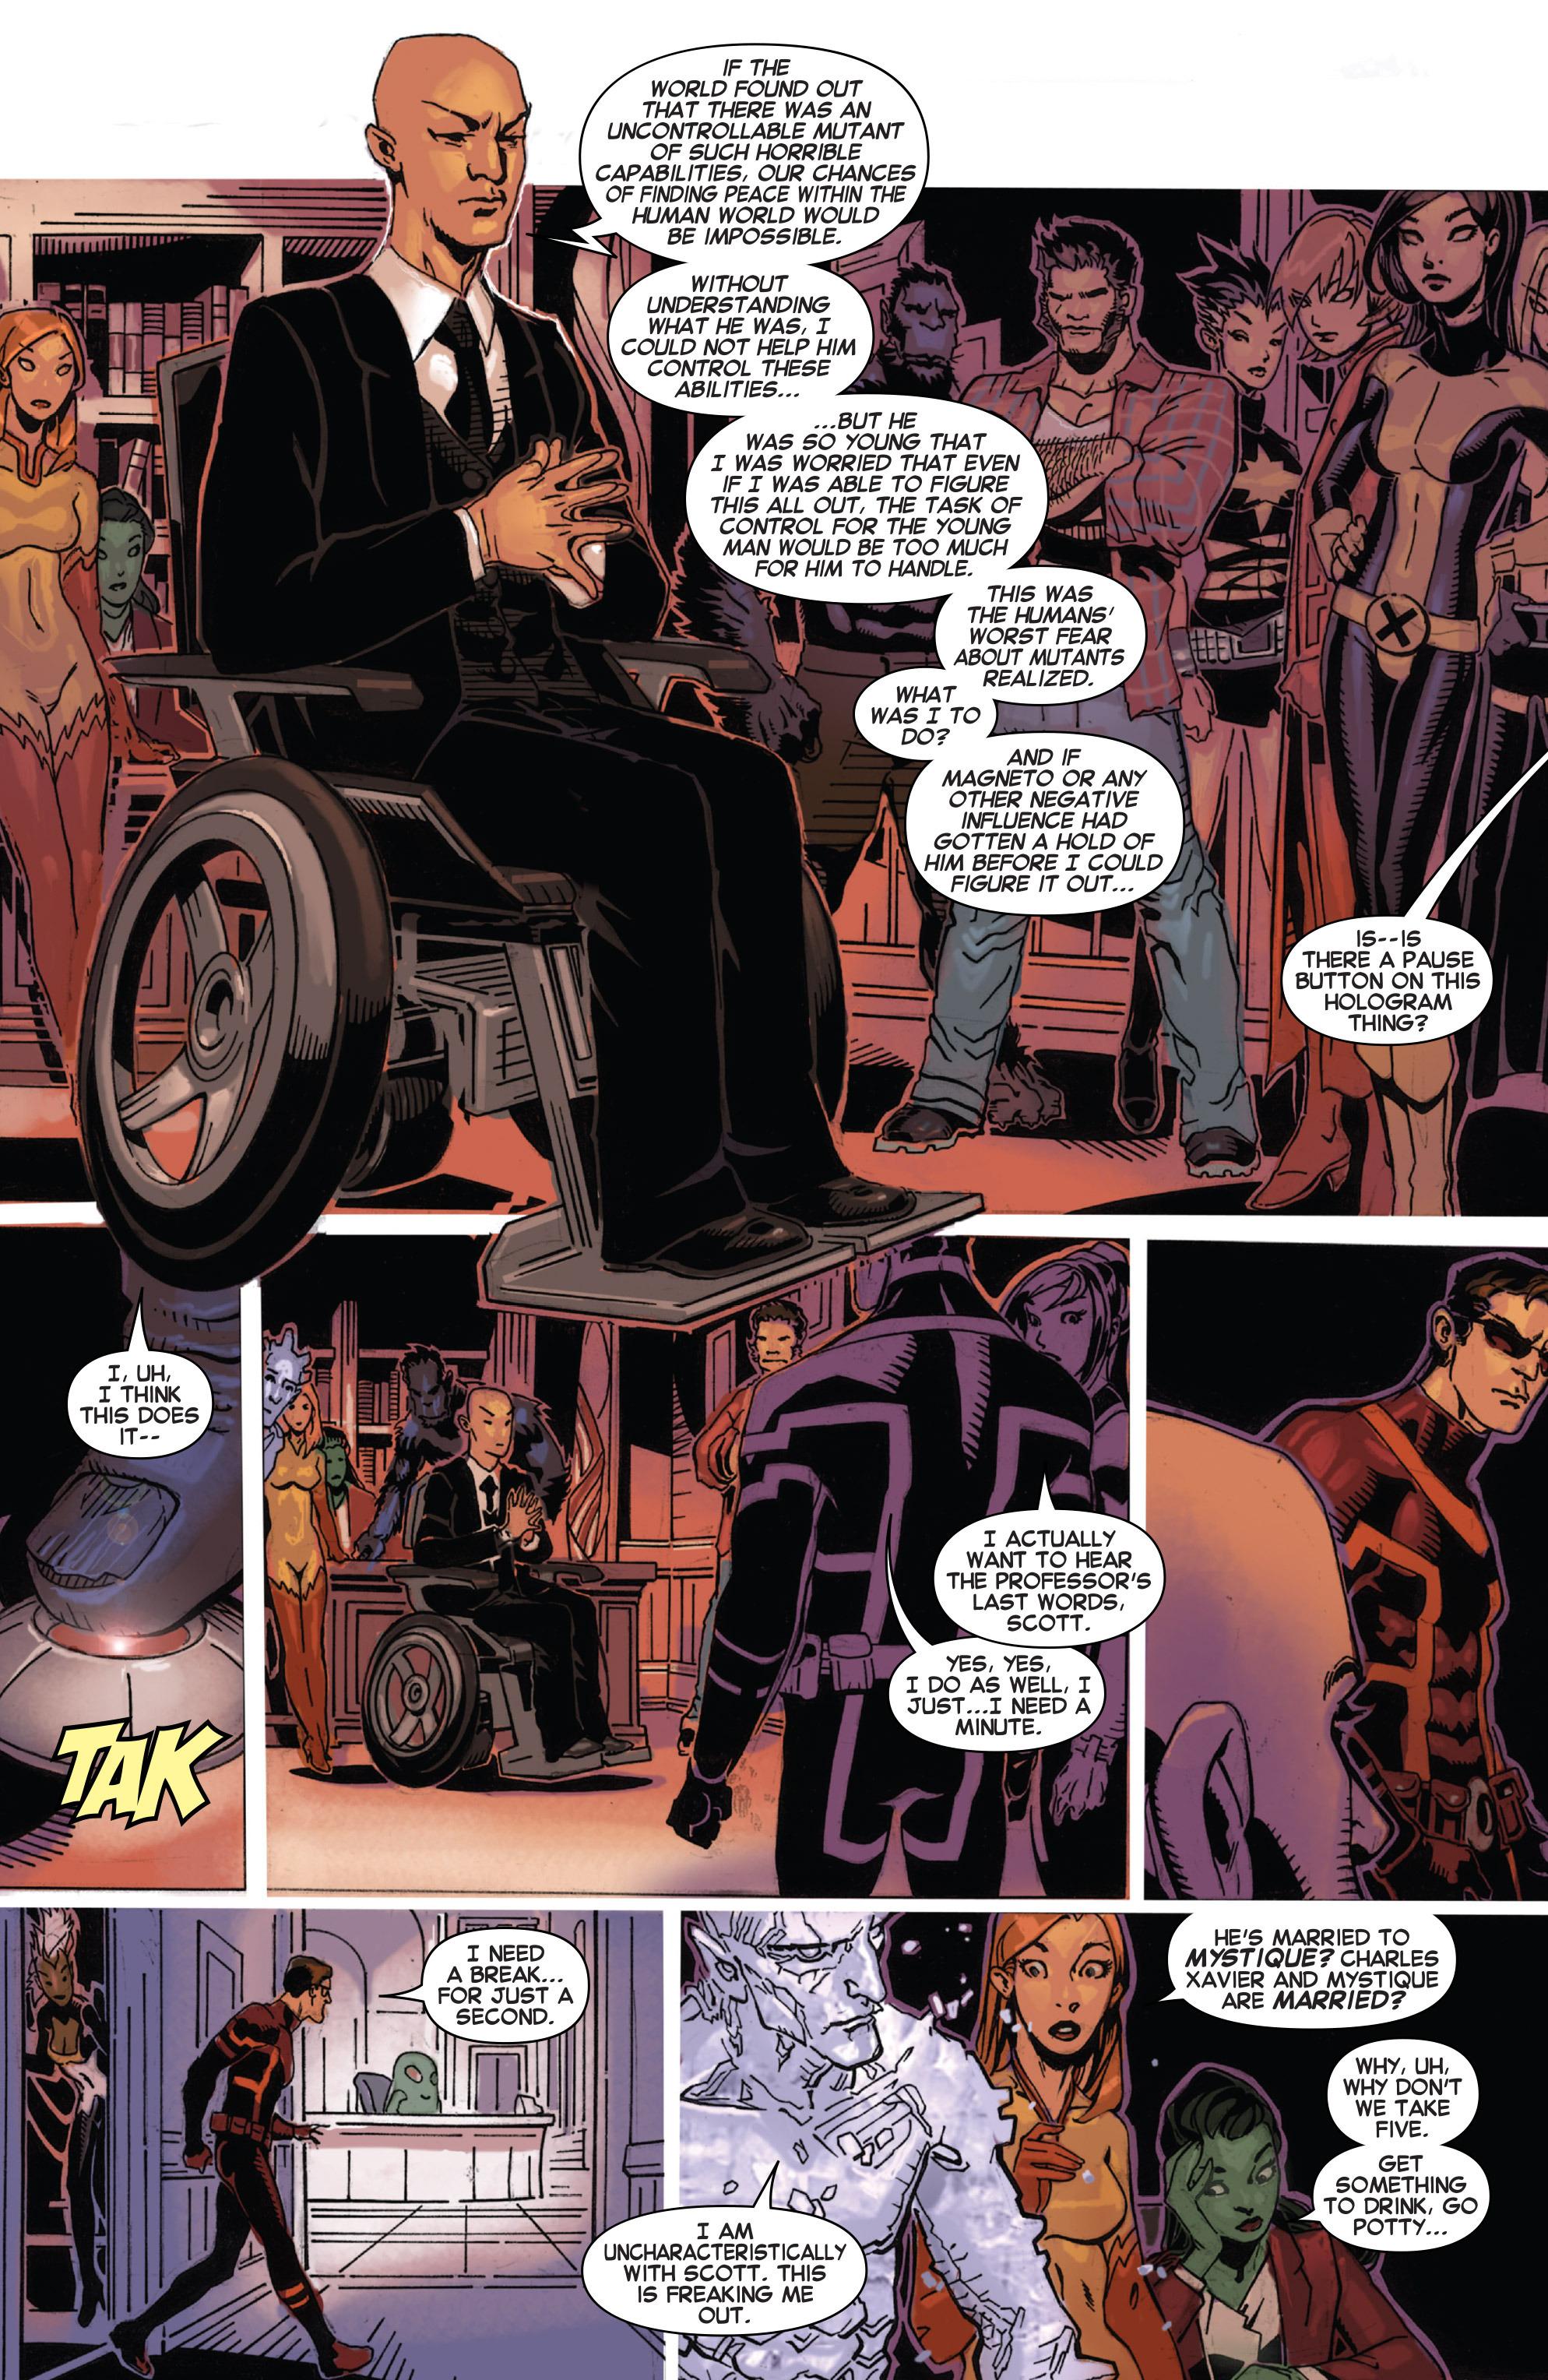 Read online Uncanny X-Men (2013) comic -  Issue # _TPB 4 - vs. S.H.I.E.L.D - 123